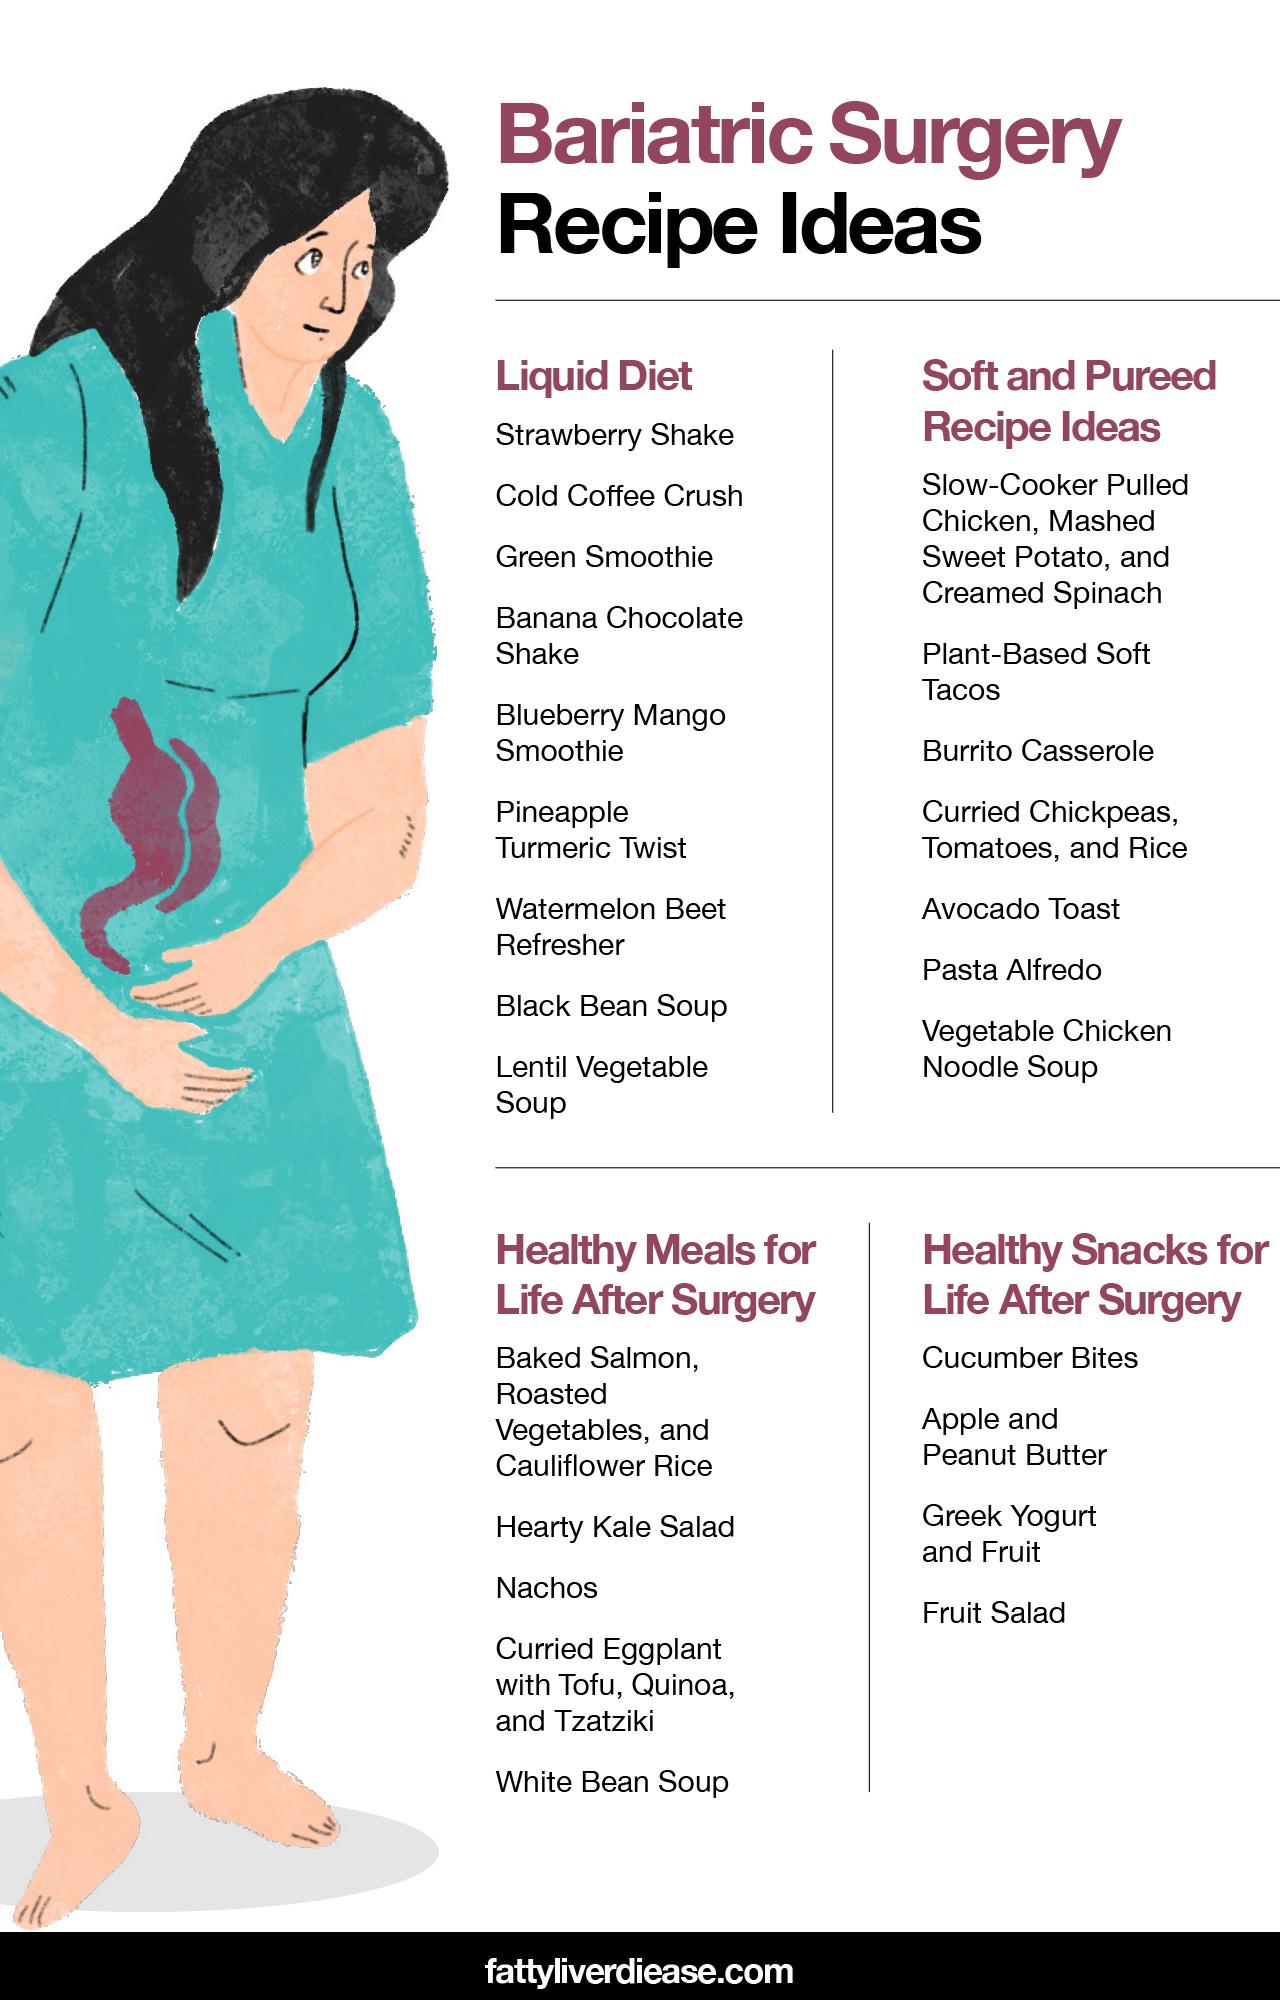 Bariatric Surgery Recipe Ideas